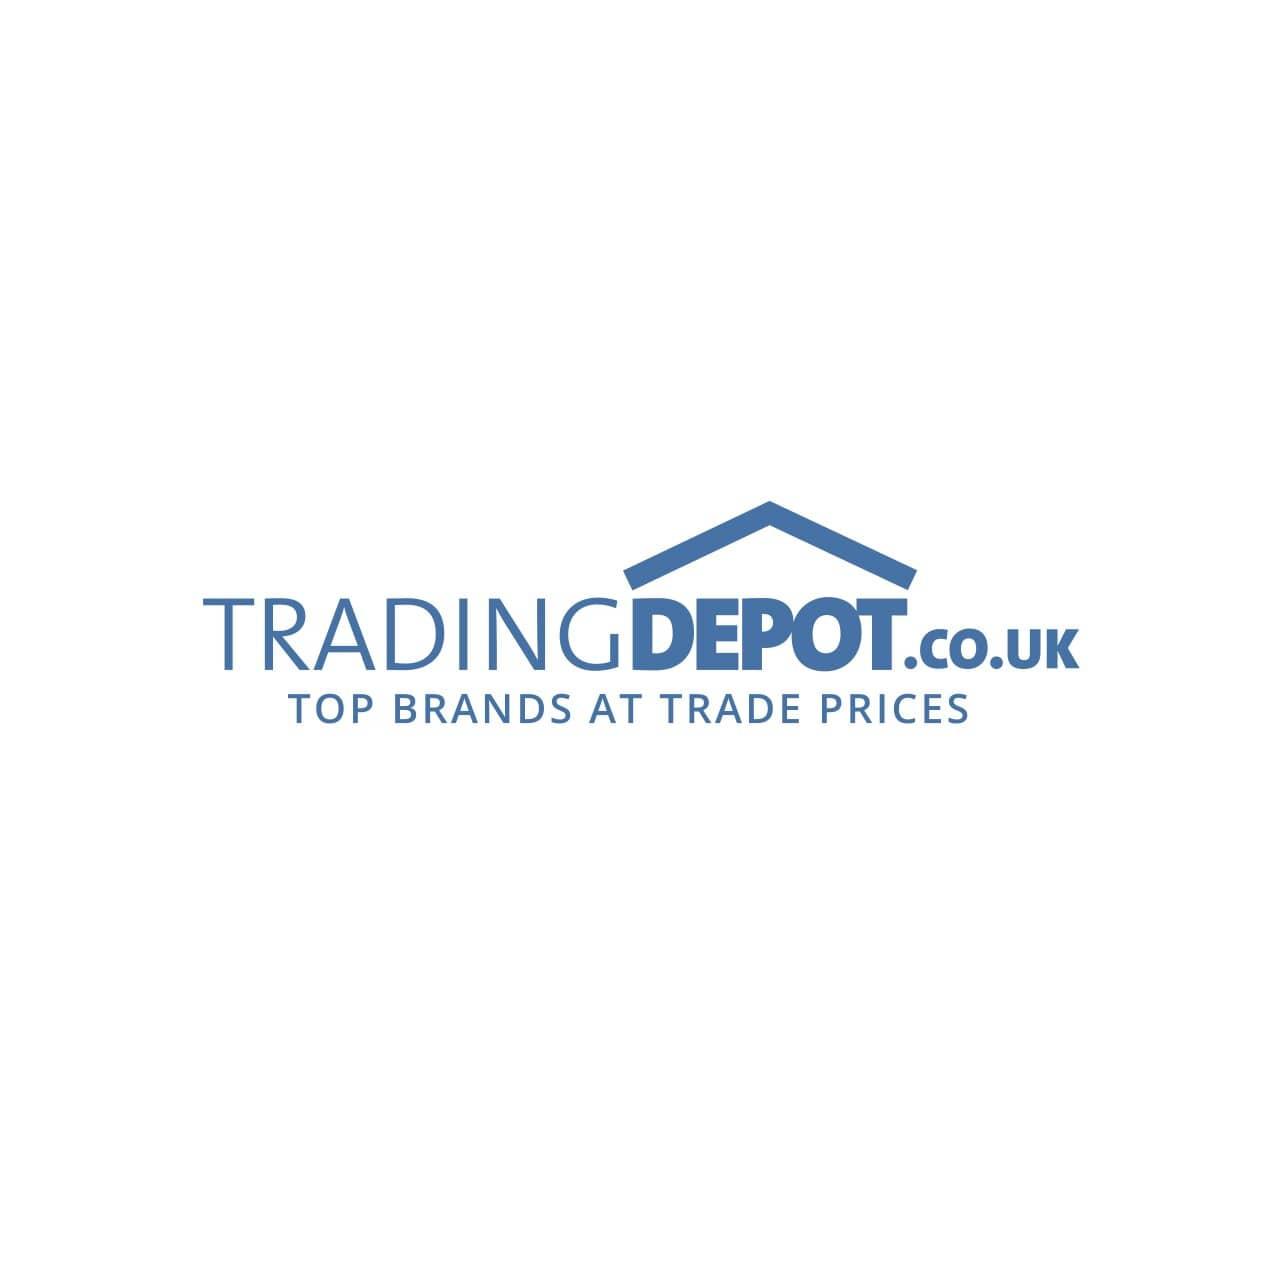 Trend TR29 x 1/4 TCT Shank Mounted Bearing Guided Profiler 12.7 x 25.4mm - TRETR2914TC